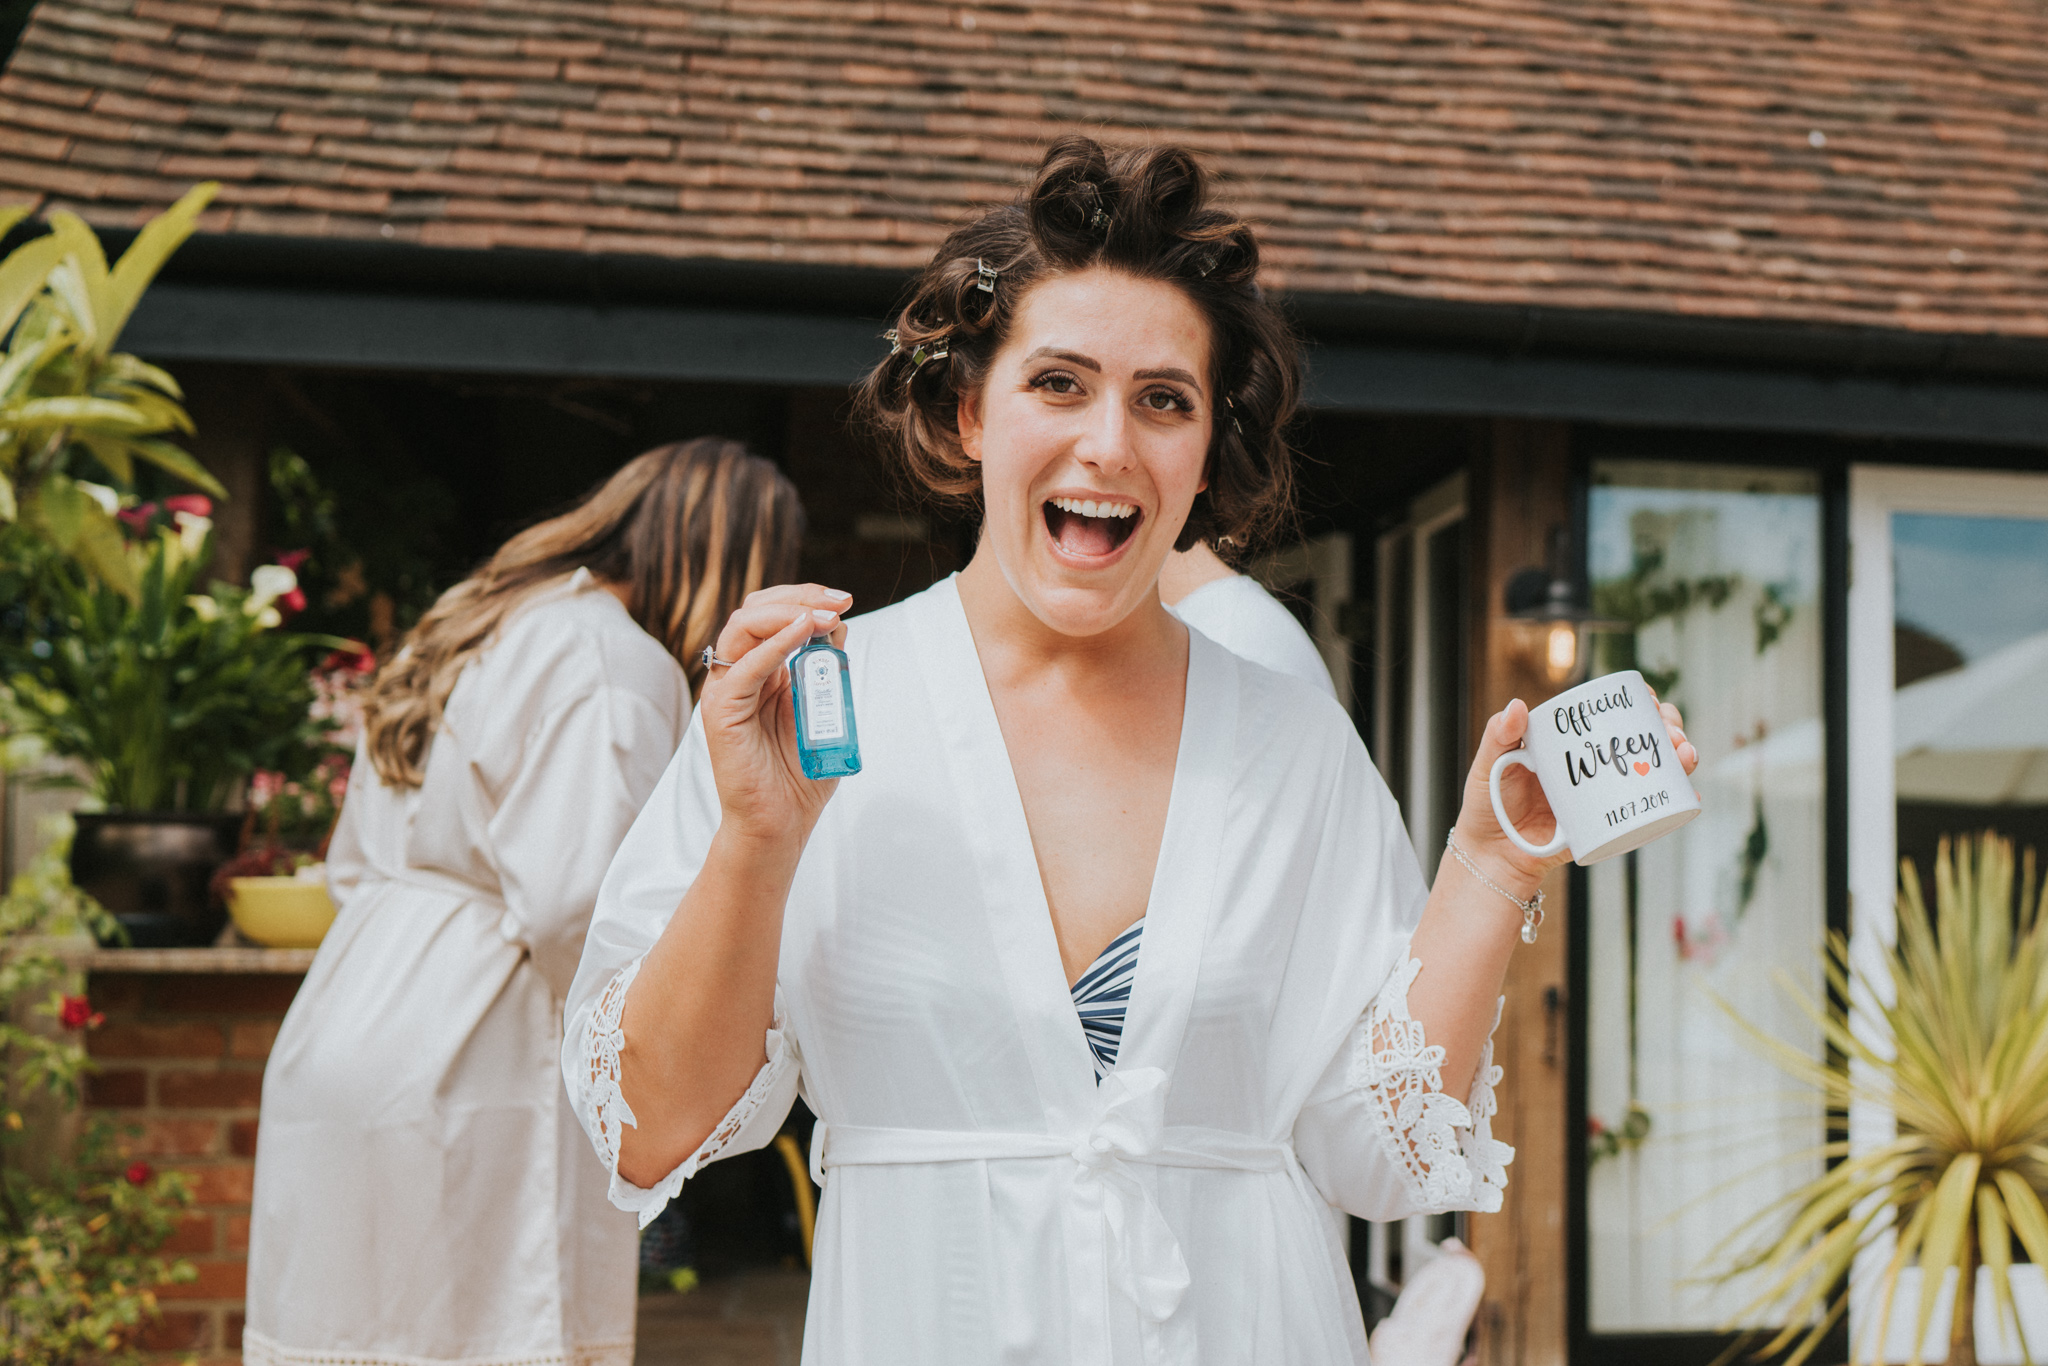 danielle-and-gareths-boho-wedding-previews-at-high-house-weddings-grace-elizabeth-colchester-essex-suffolk-norfolk-devon-alternative-wedding-and-lifestyle-photographer (6 of 76).jpg